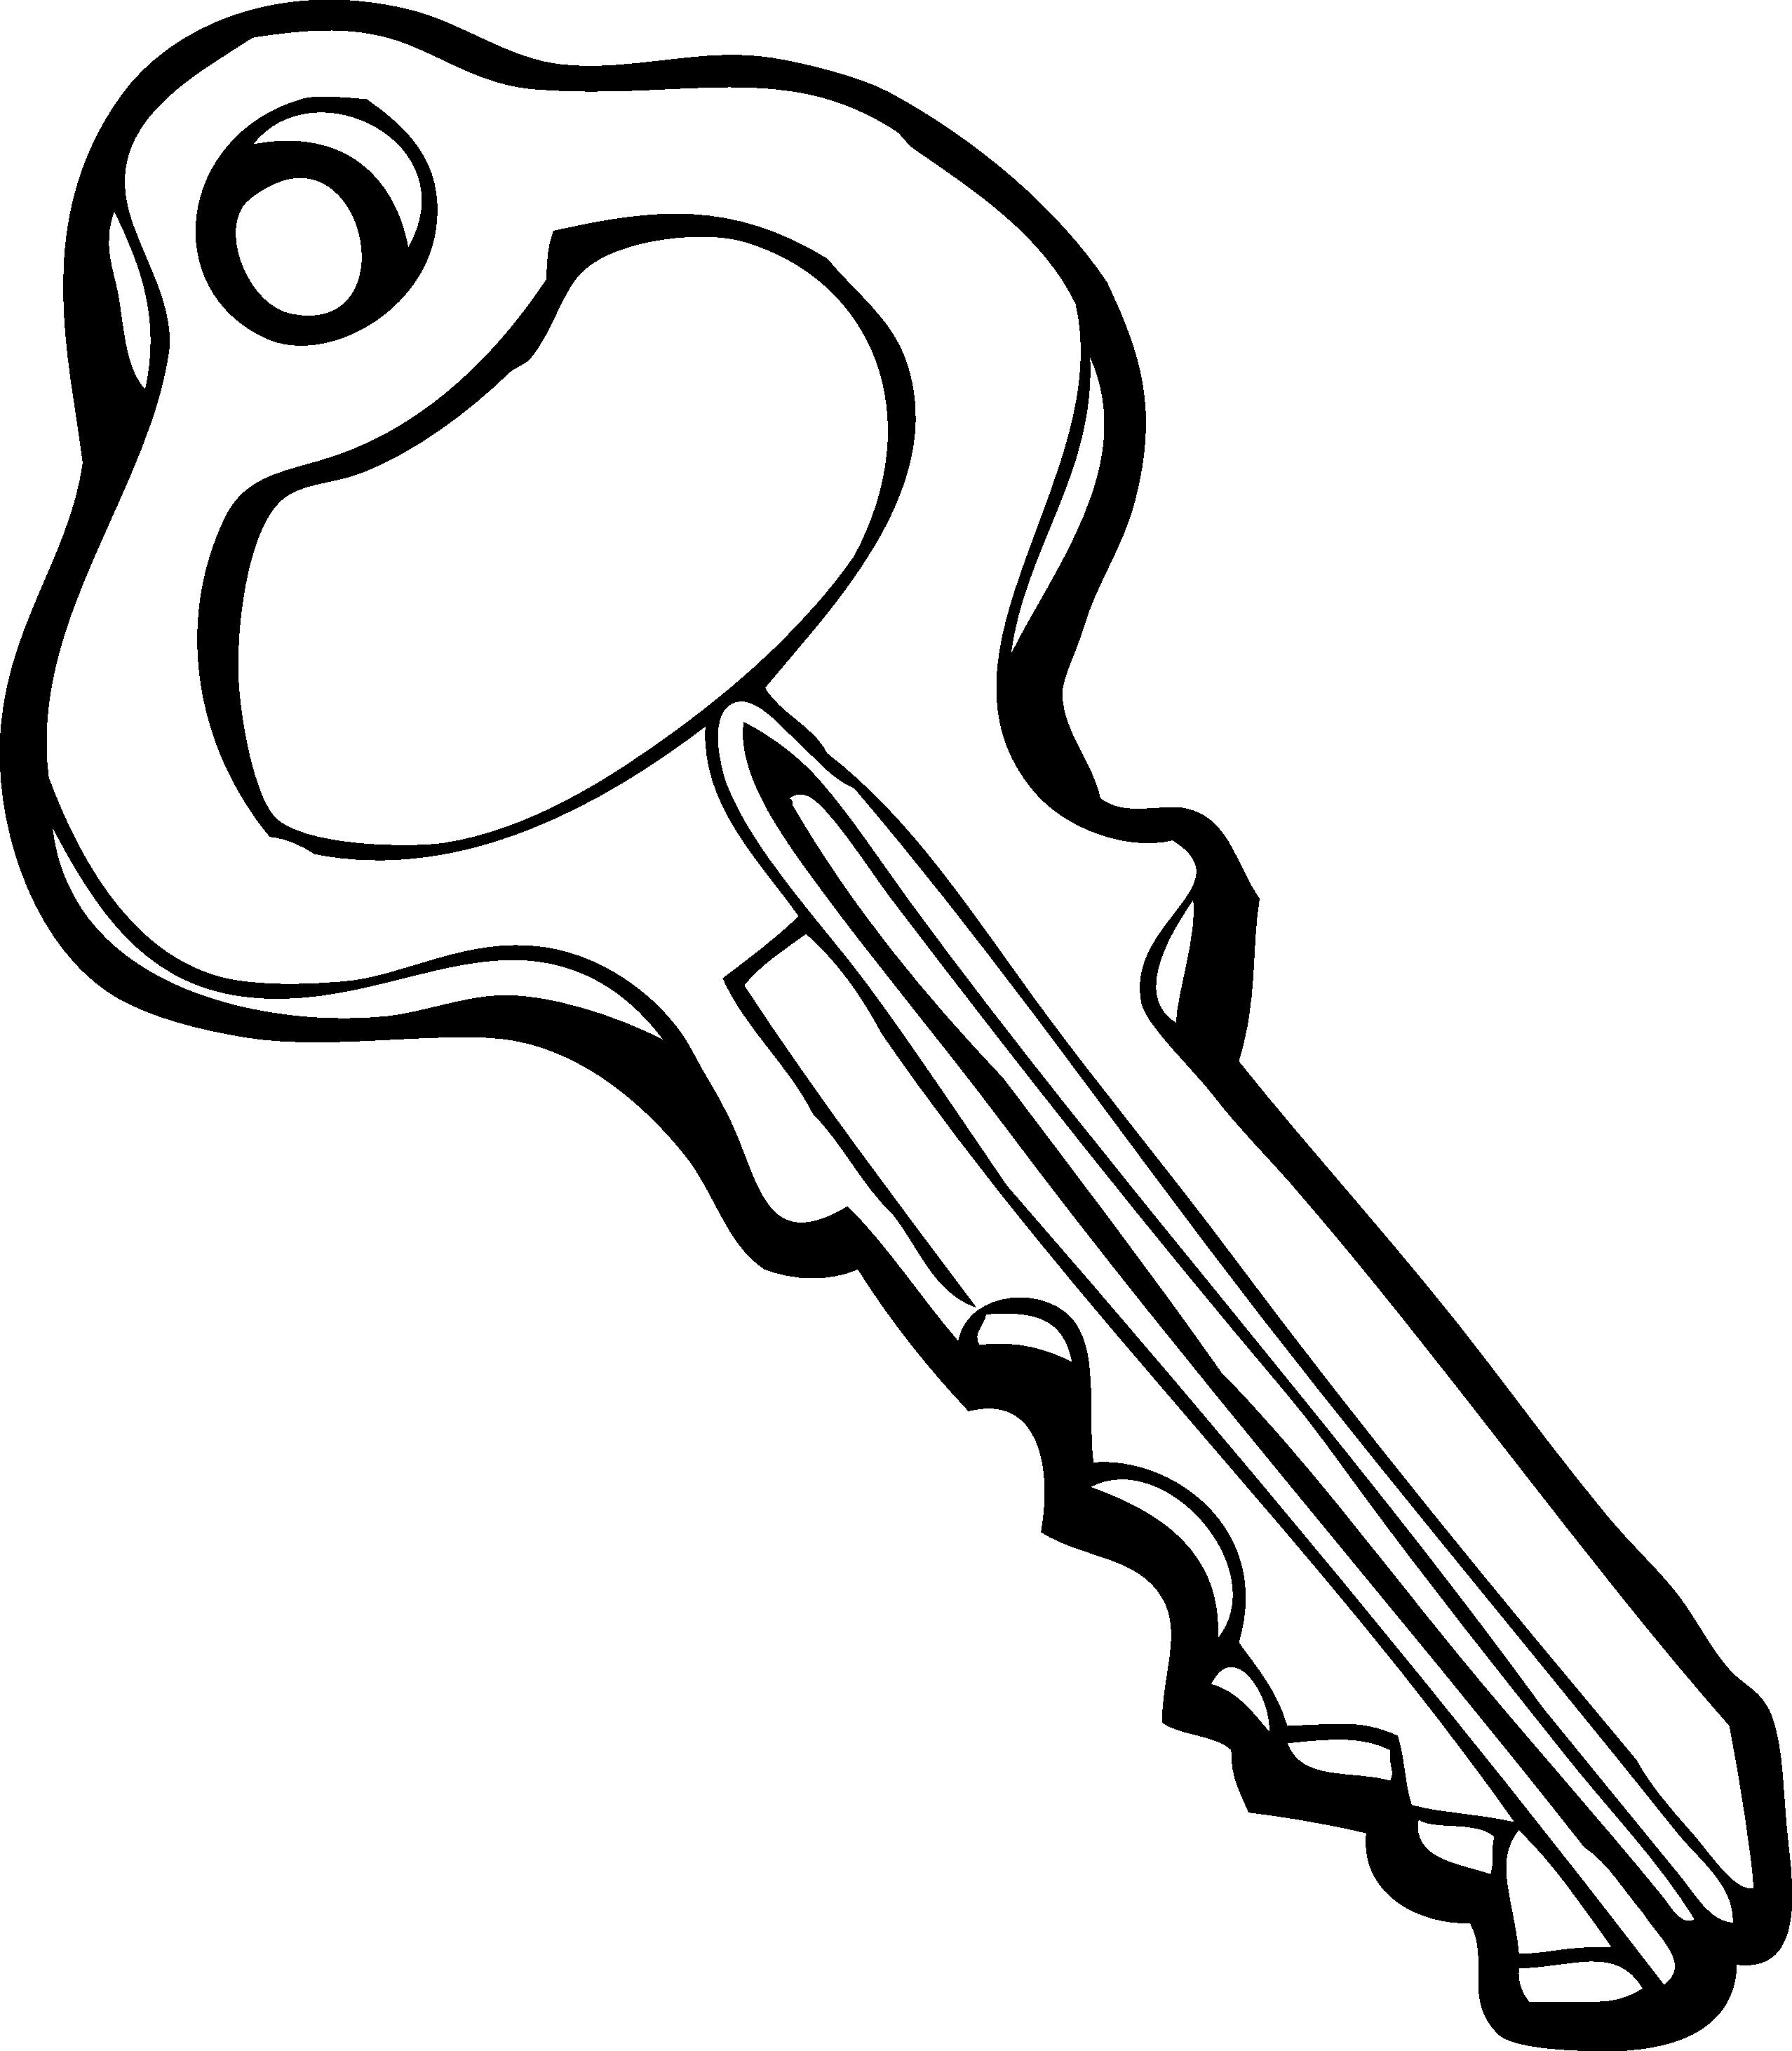 2555x2924 Key Clipart Black And White